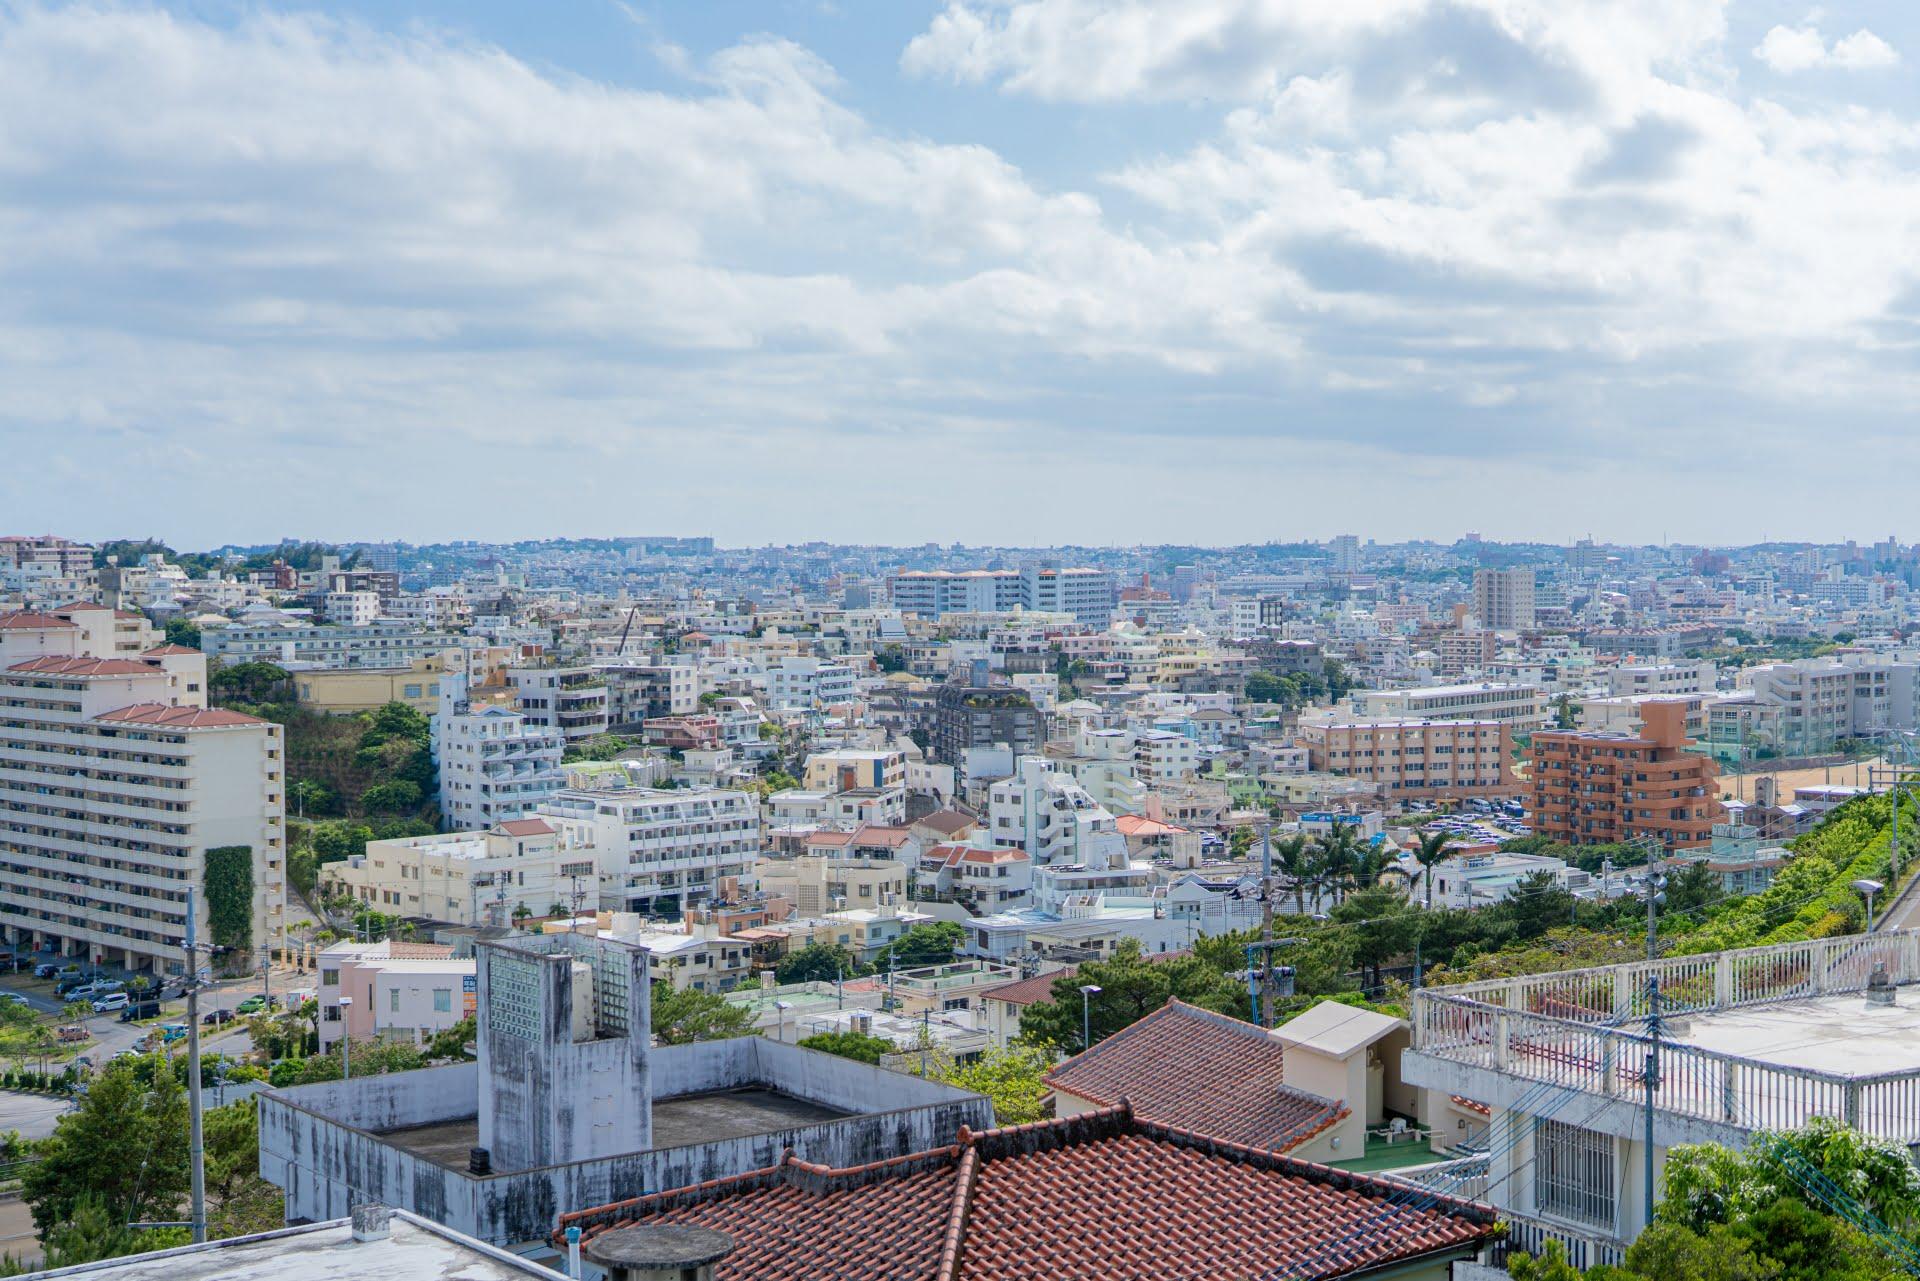 Naha City, Okinawa Prefecture